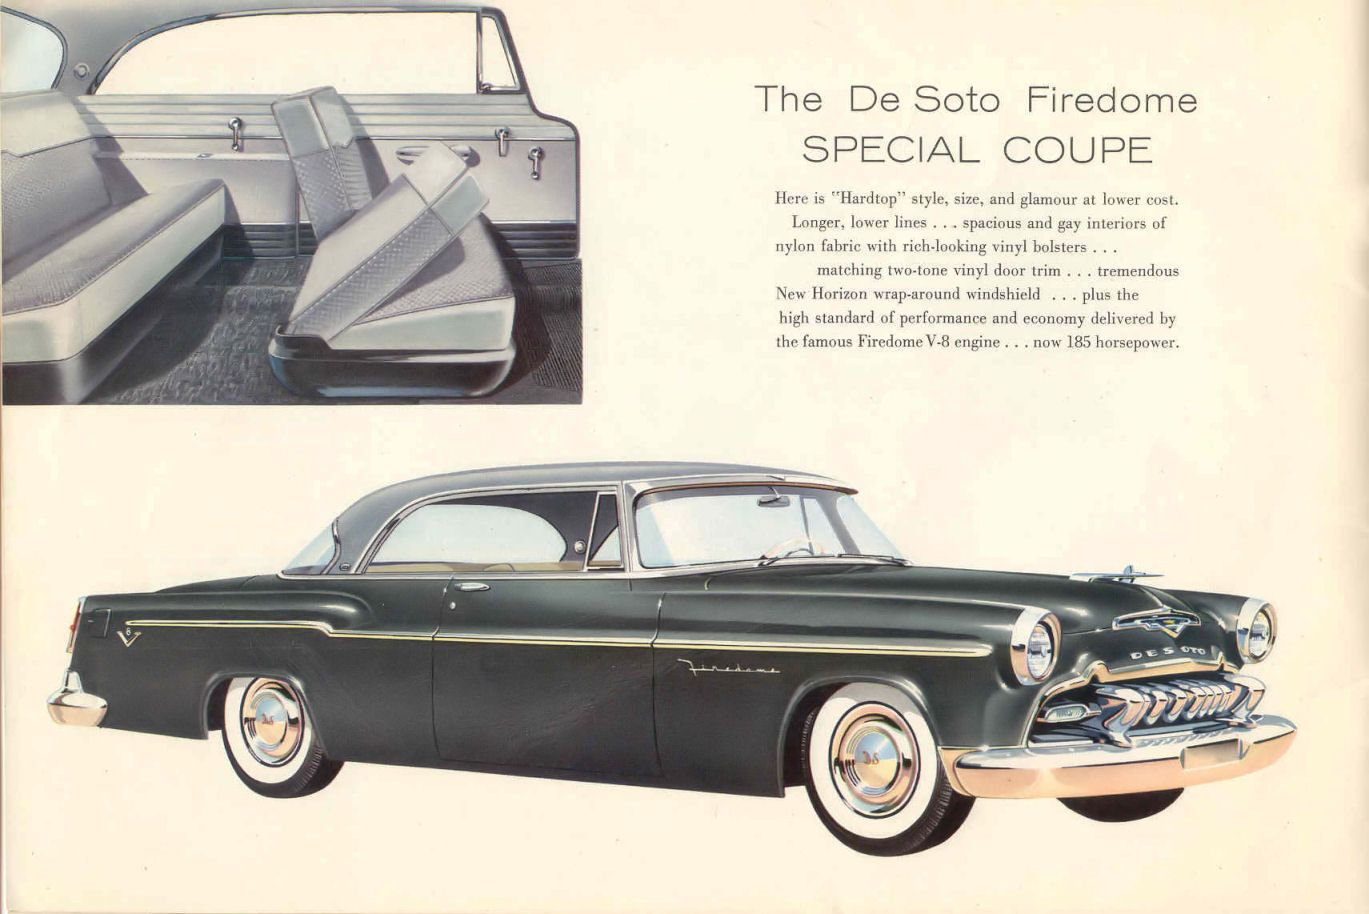 1956 desoto firedome seville 4 door hardtop 1 of 10 - 1955 Desoto Firedome Special Coupe